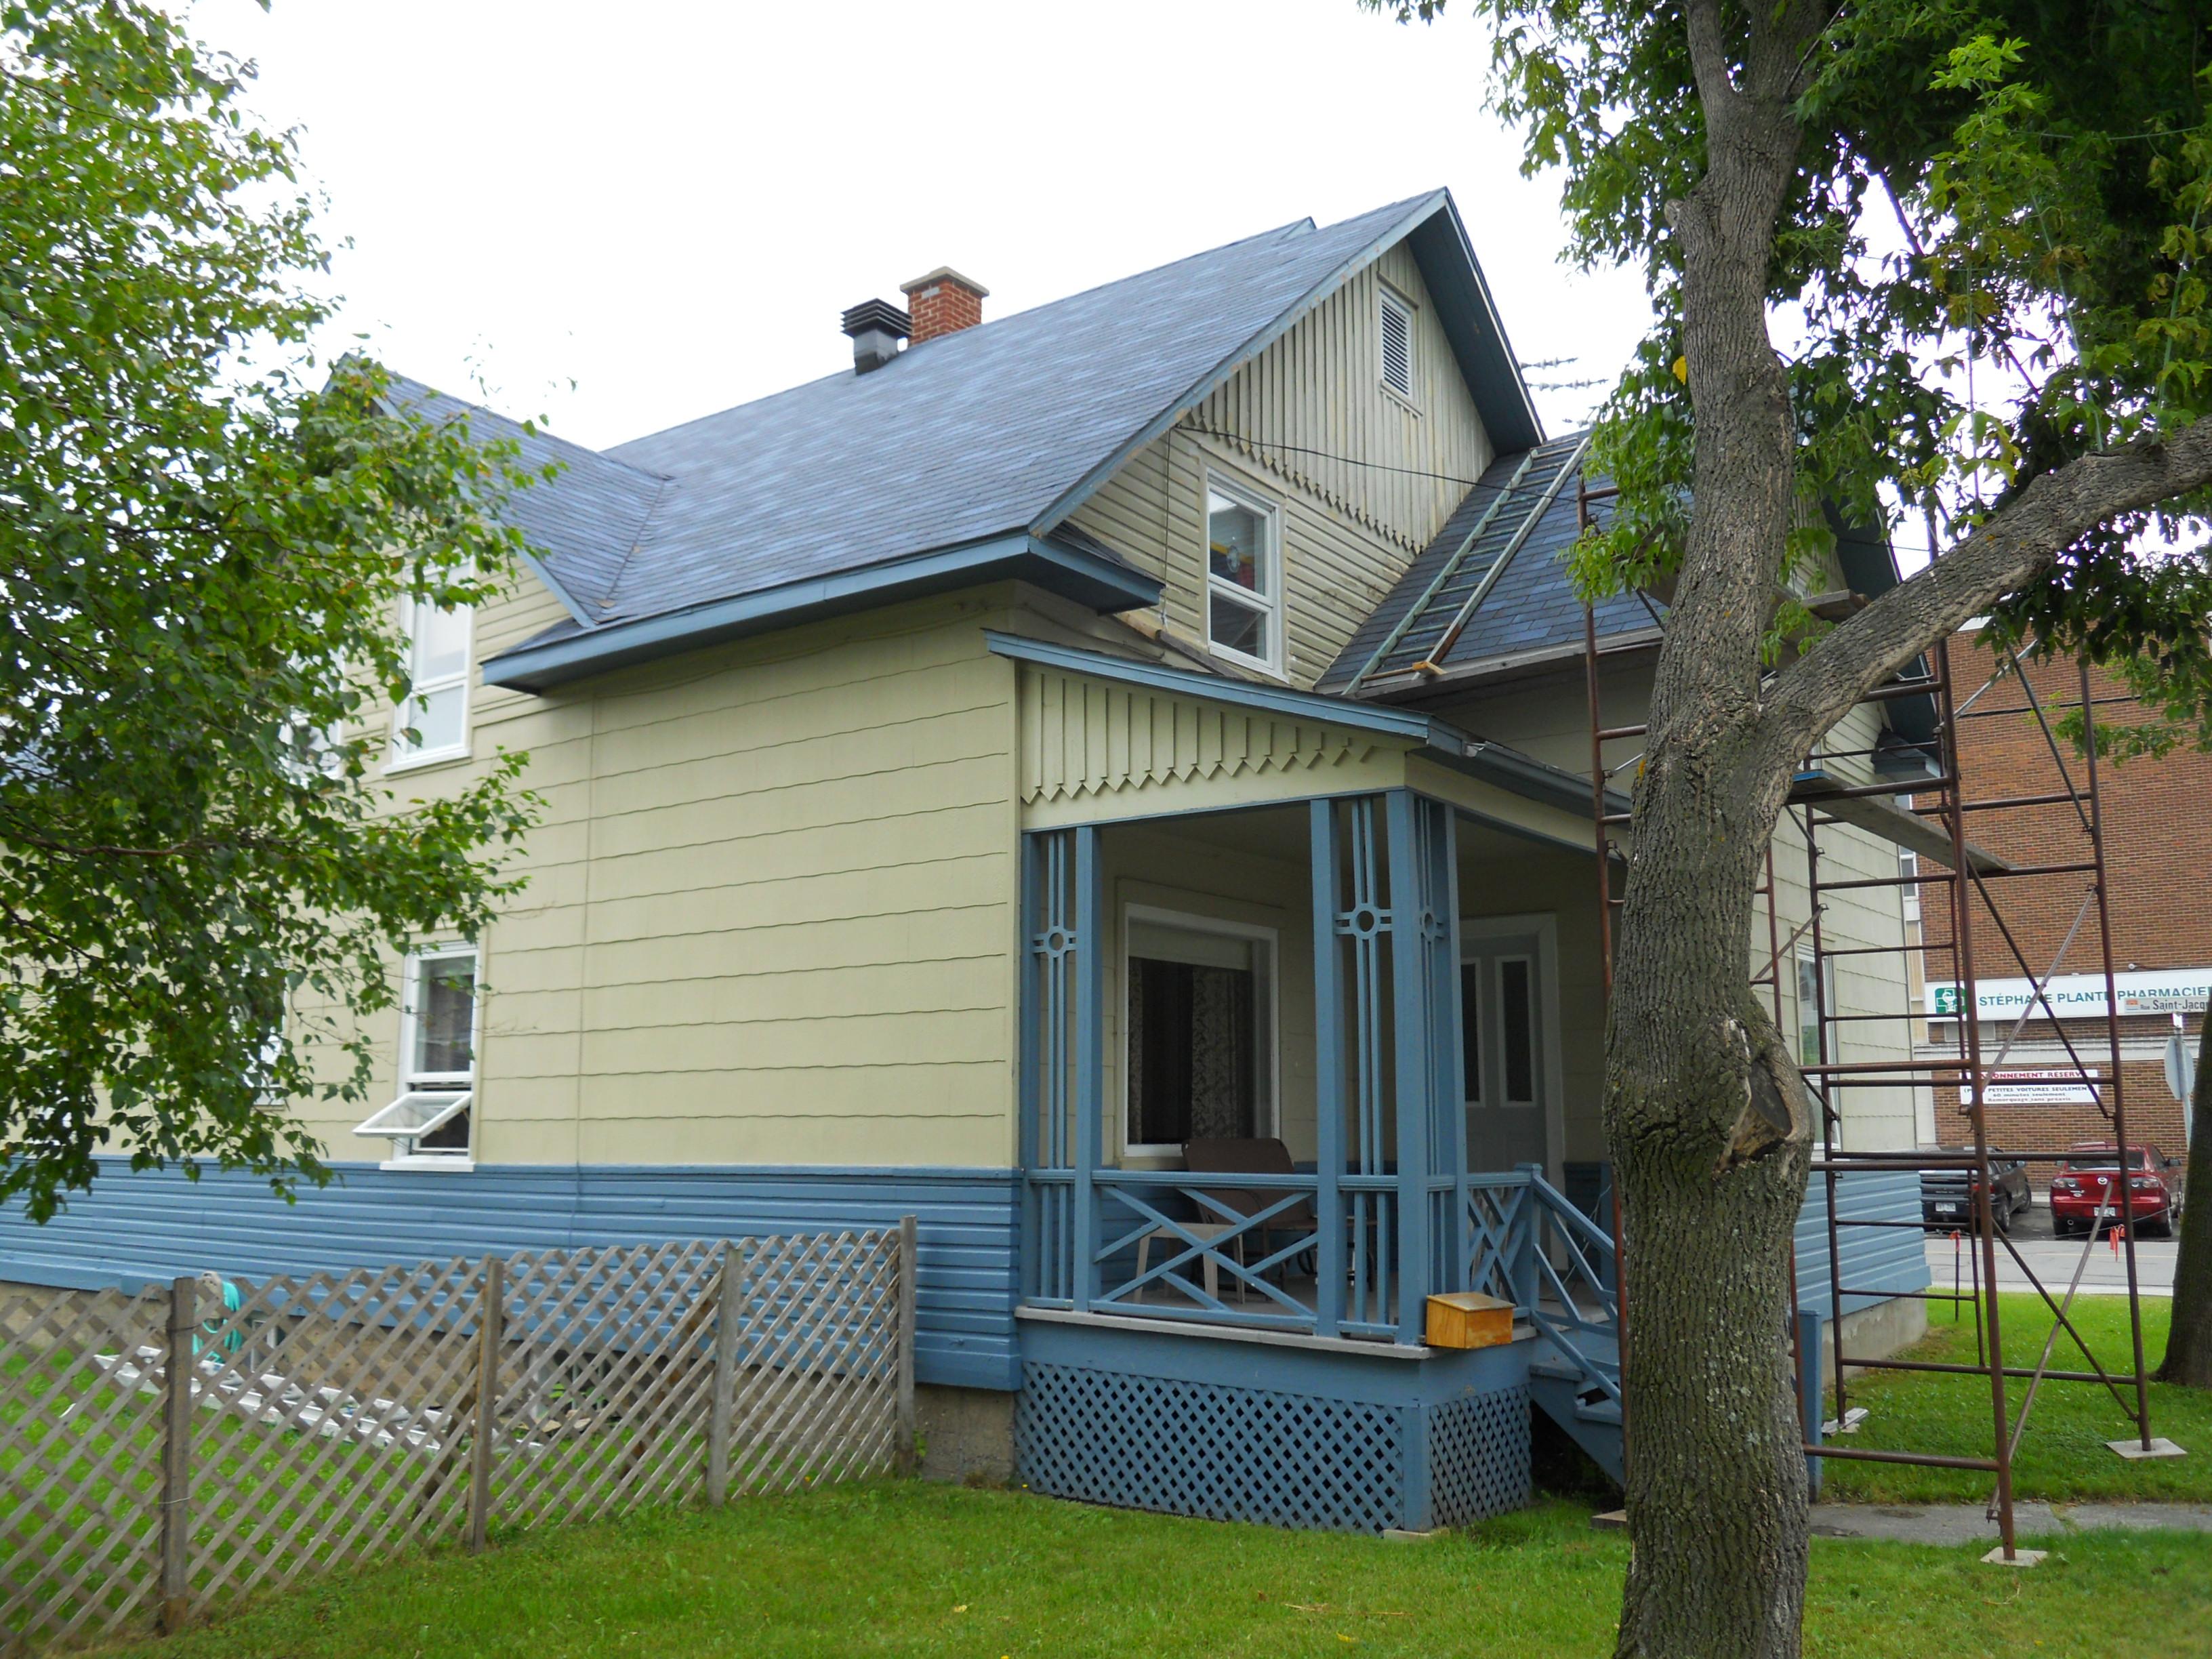 1227 - 169, avenue Rouleau